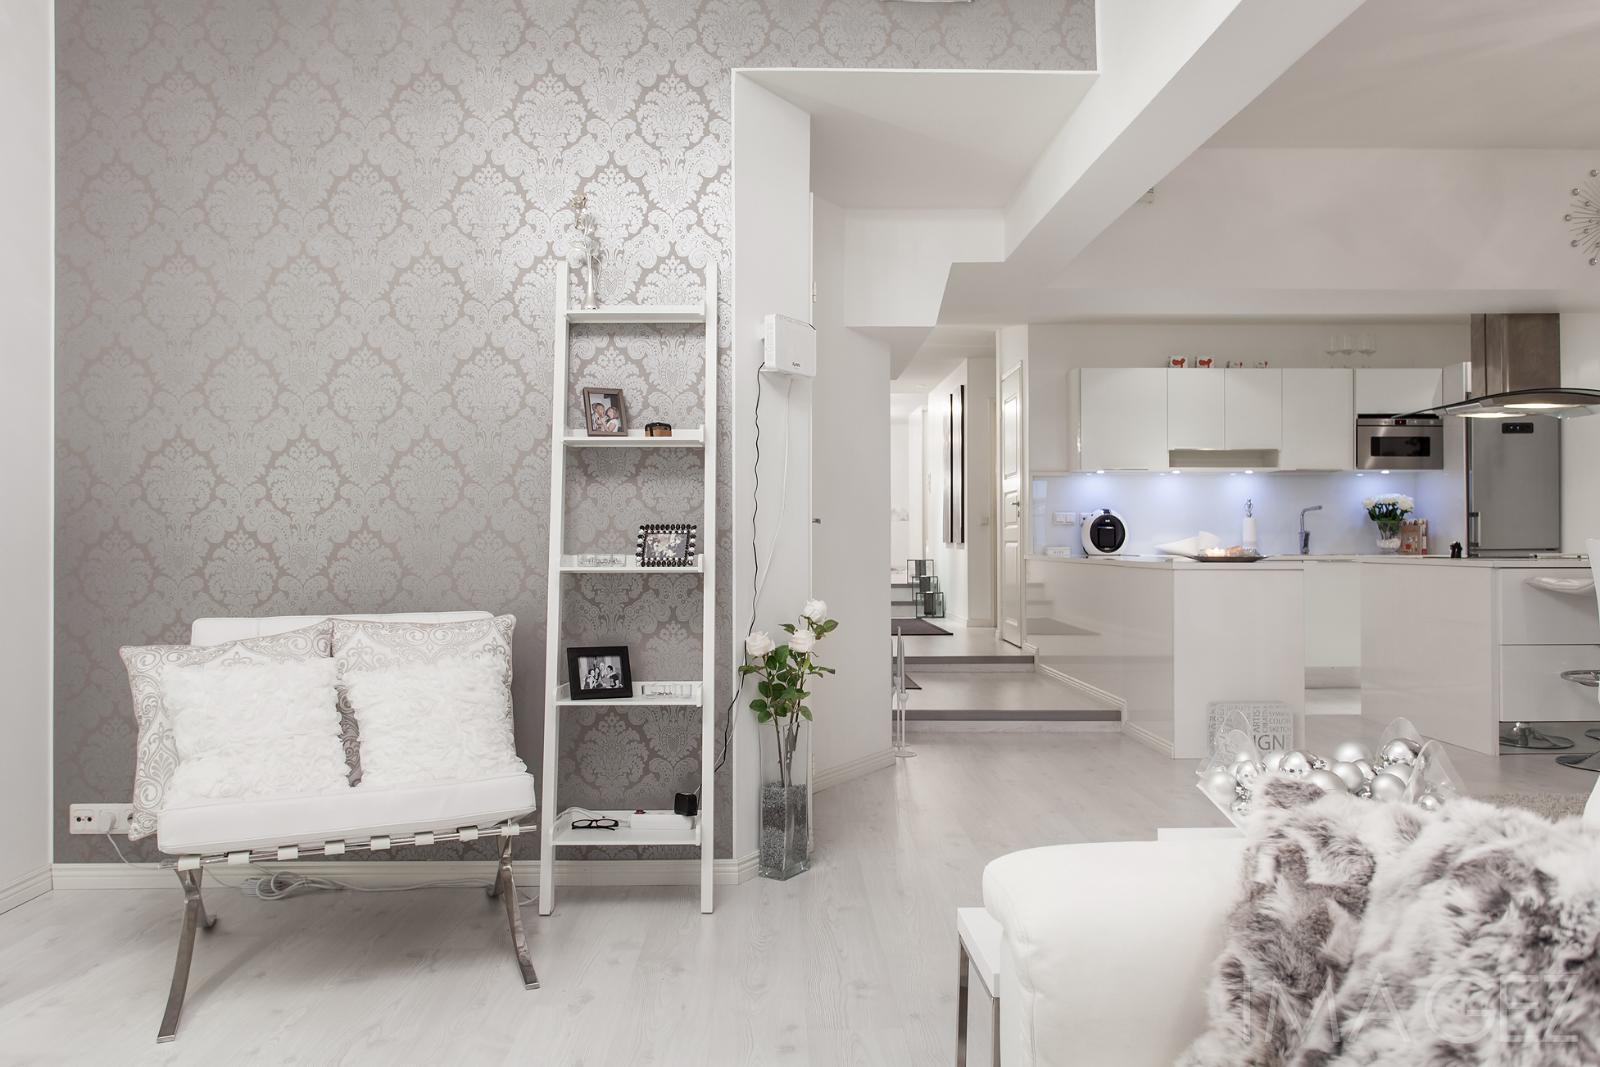 Moderni keittiö 9543331  Etuovi com Ideat & vinkit